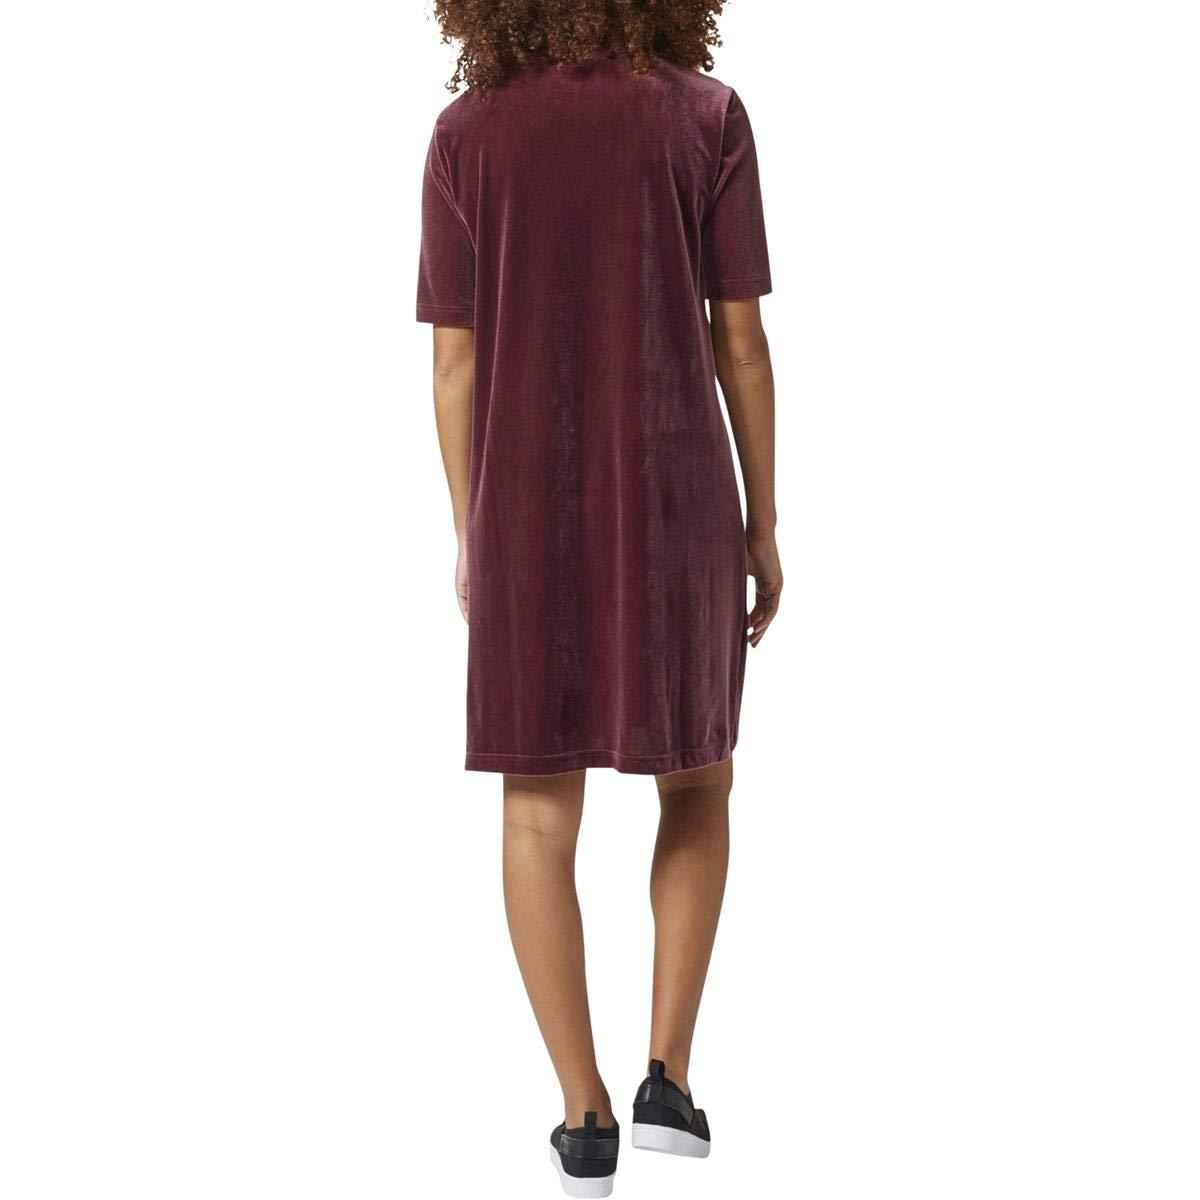 01ef31e6a008 adidas Women s Originals Velvet Vibes Short Dress CW0280 at Amazon Women s  Clothing store